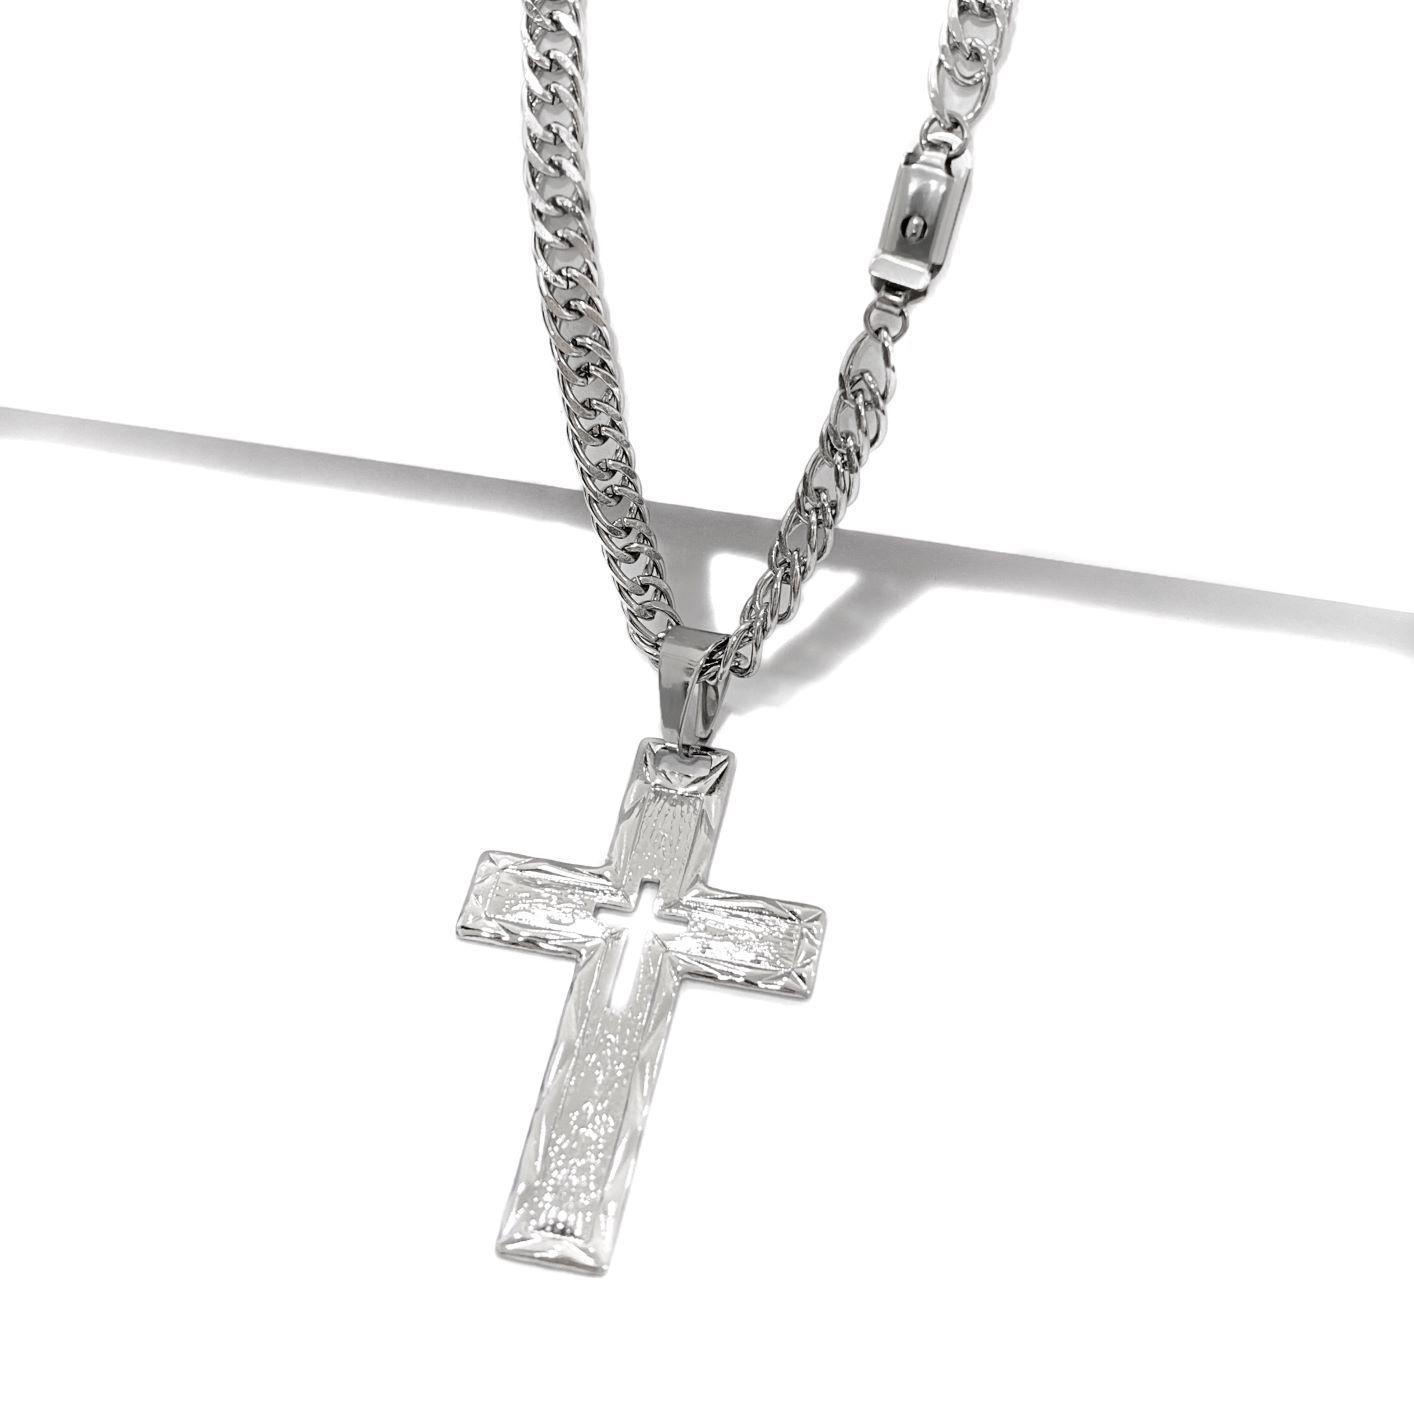 Exclusivo ML - Kit 01 Aço Inox Double Grumet 6mm 70cm + Crucifixo Vazado 70cm ref.5.544 *